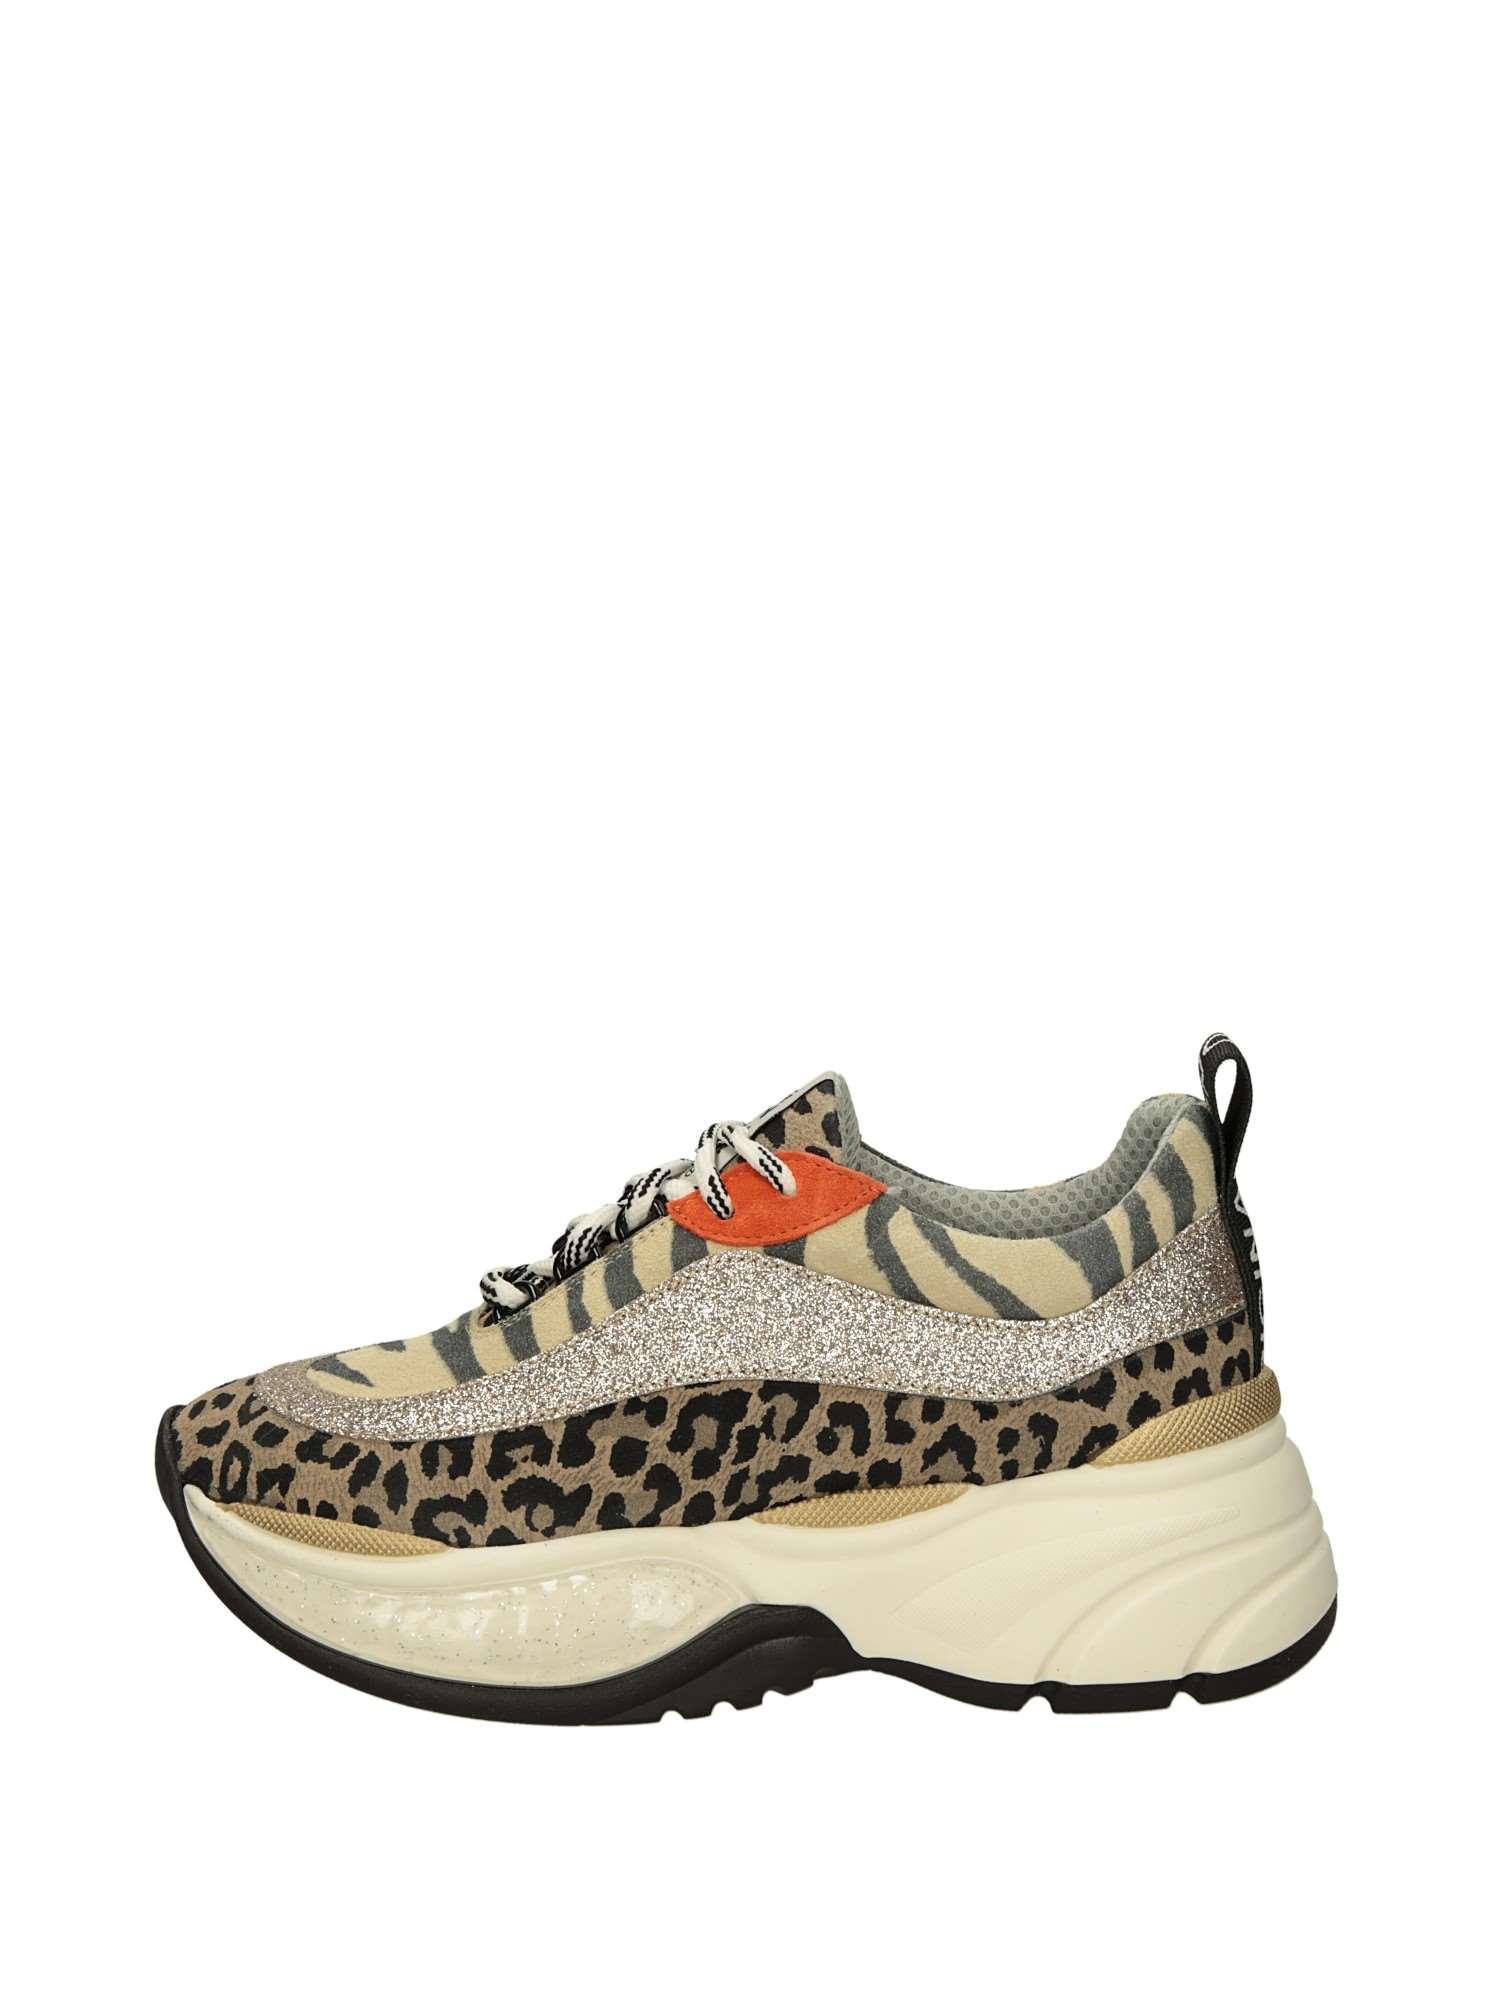 b7f4ef596 Meline Sneakers Zeppa Sabbia   Sneakers Zeppa Donna 100% Tessuto ...